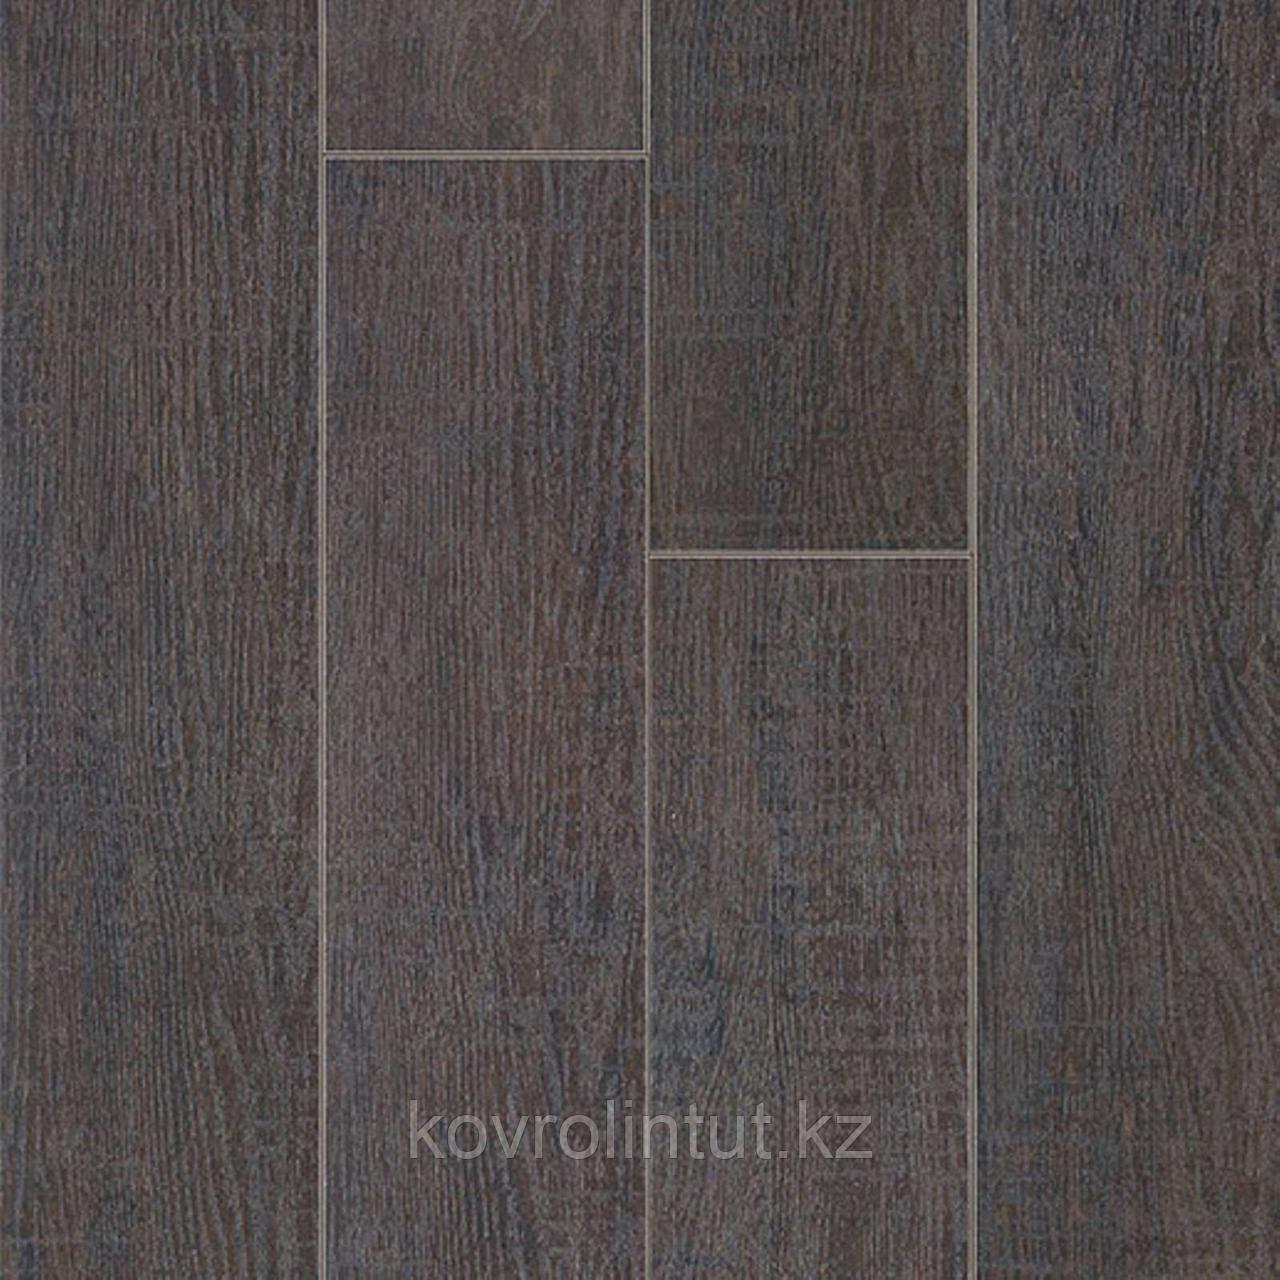 Плитка ПВХ клеевая Tarkett Art Vinyl Lounge Bali 230345016